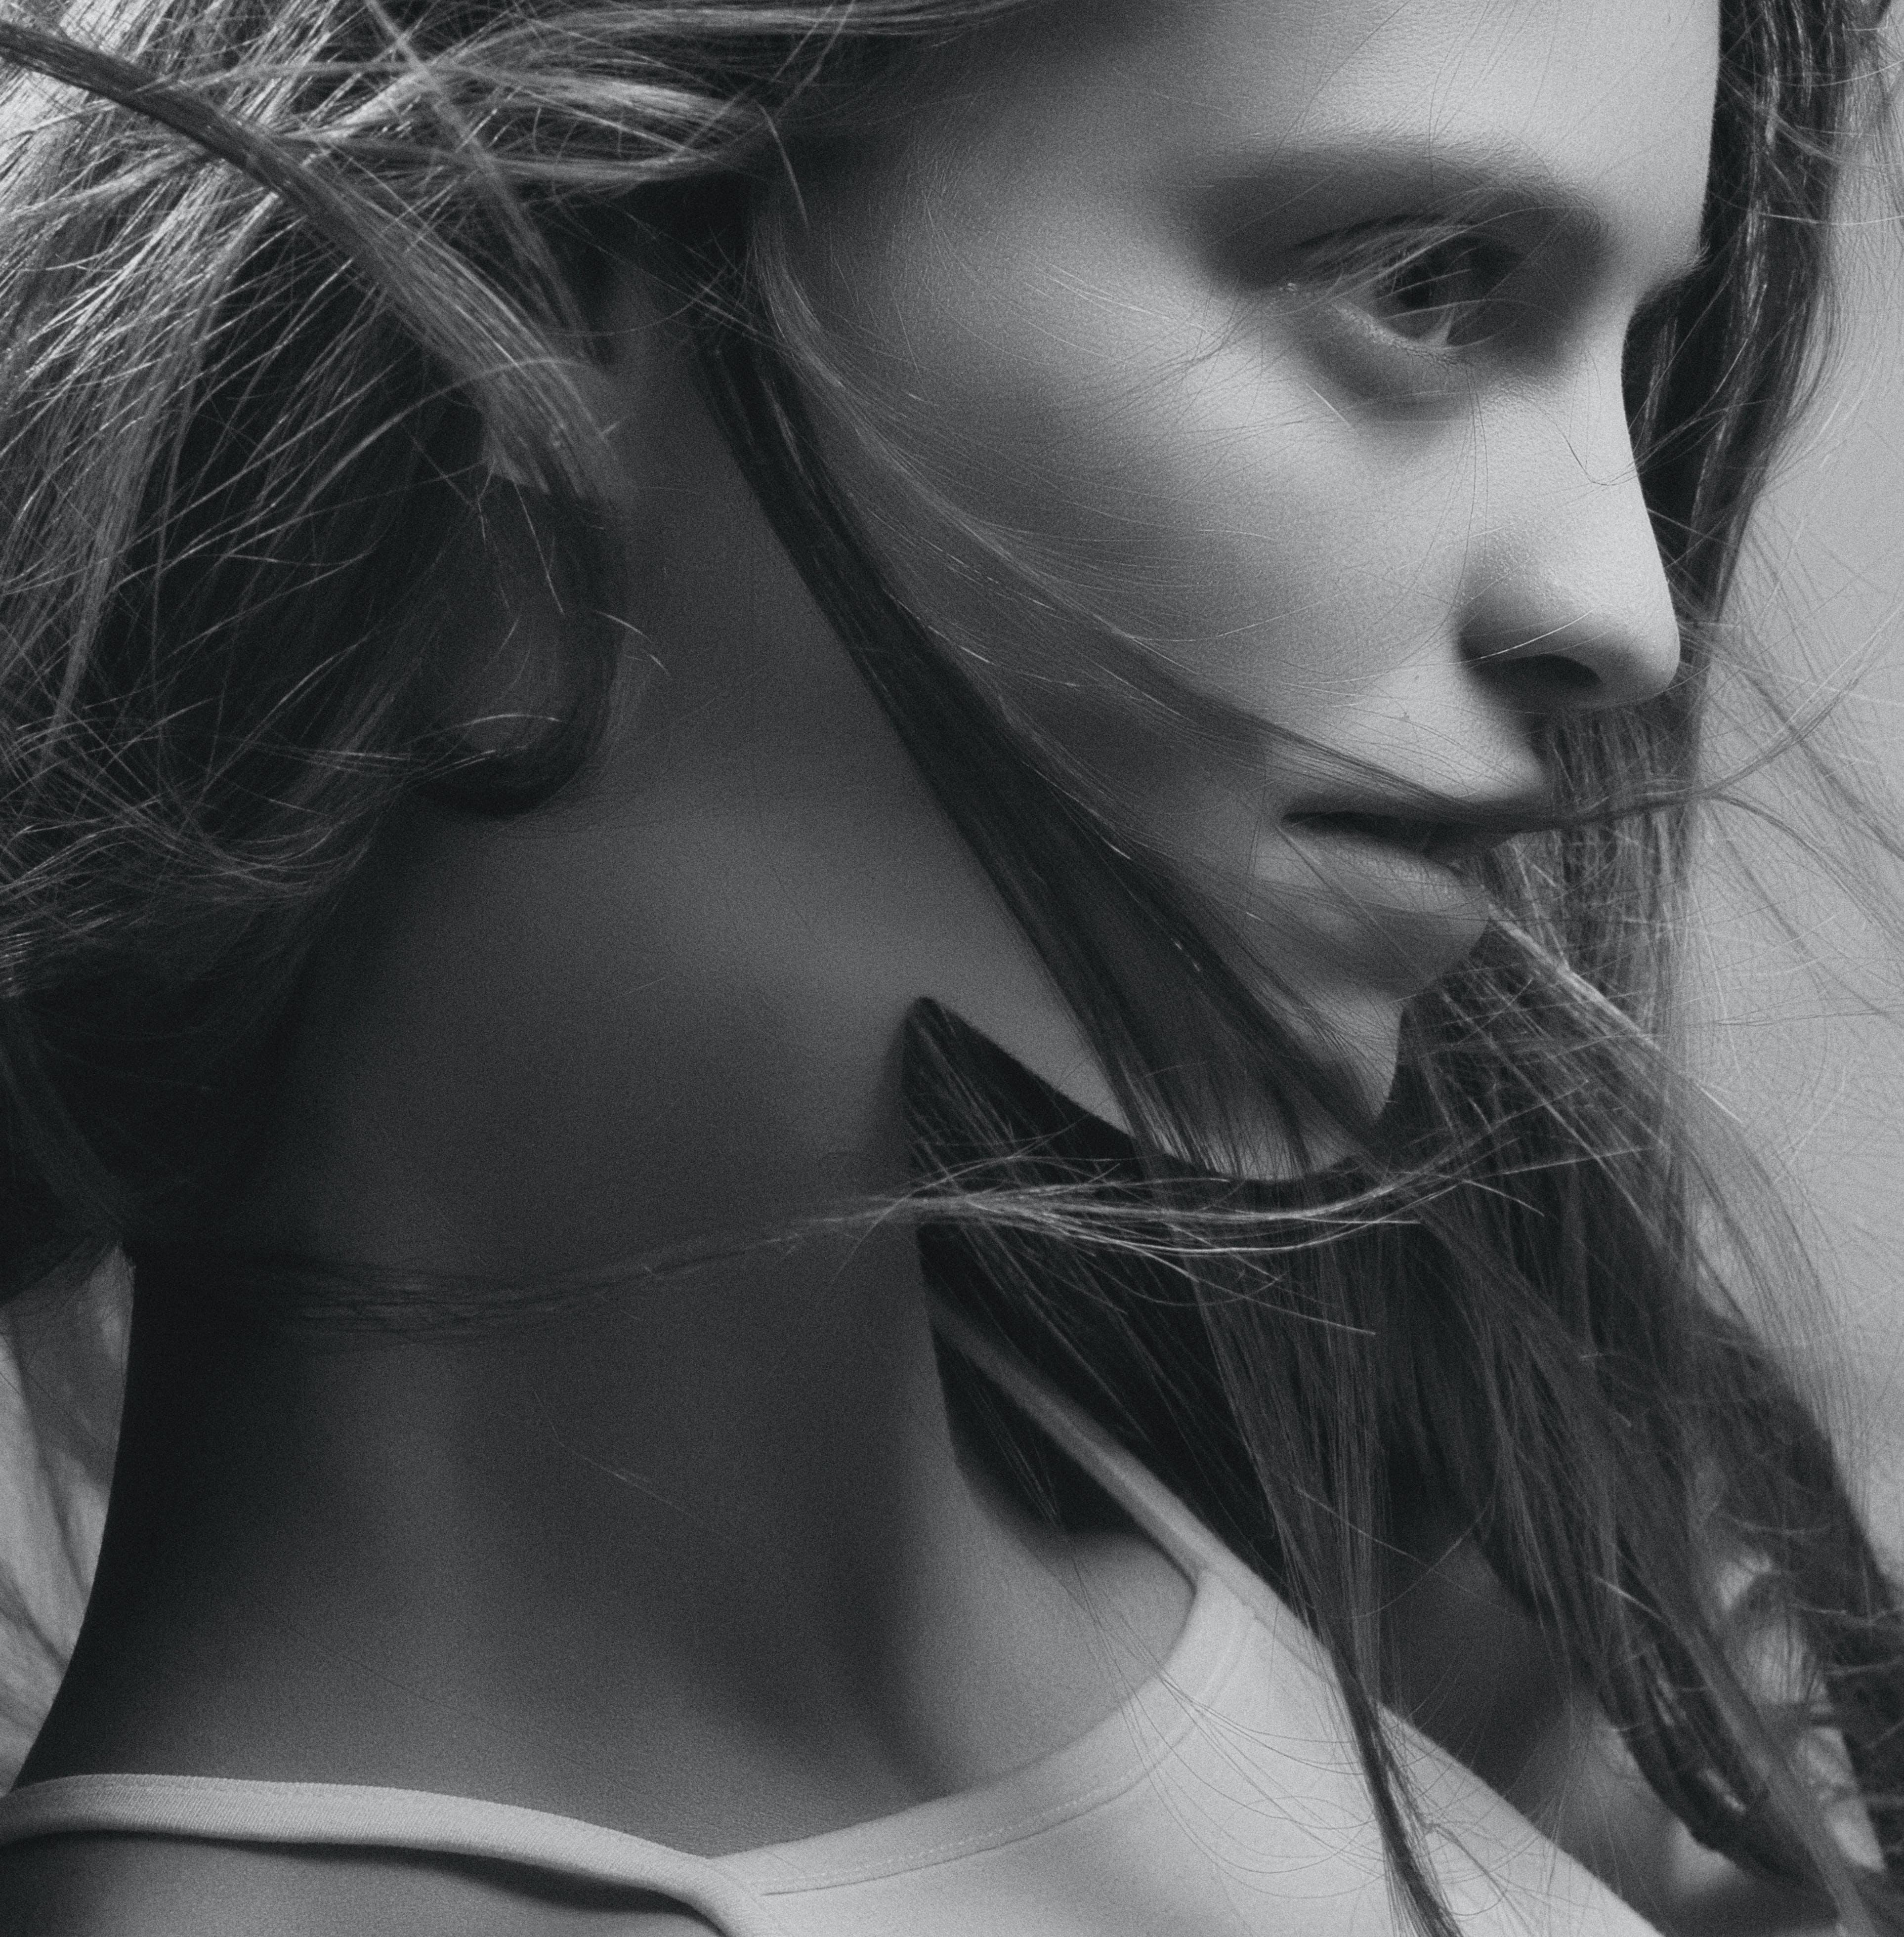 Free stock photo of black and white, girl, portrait, studio